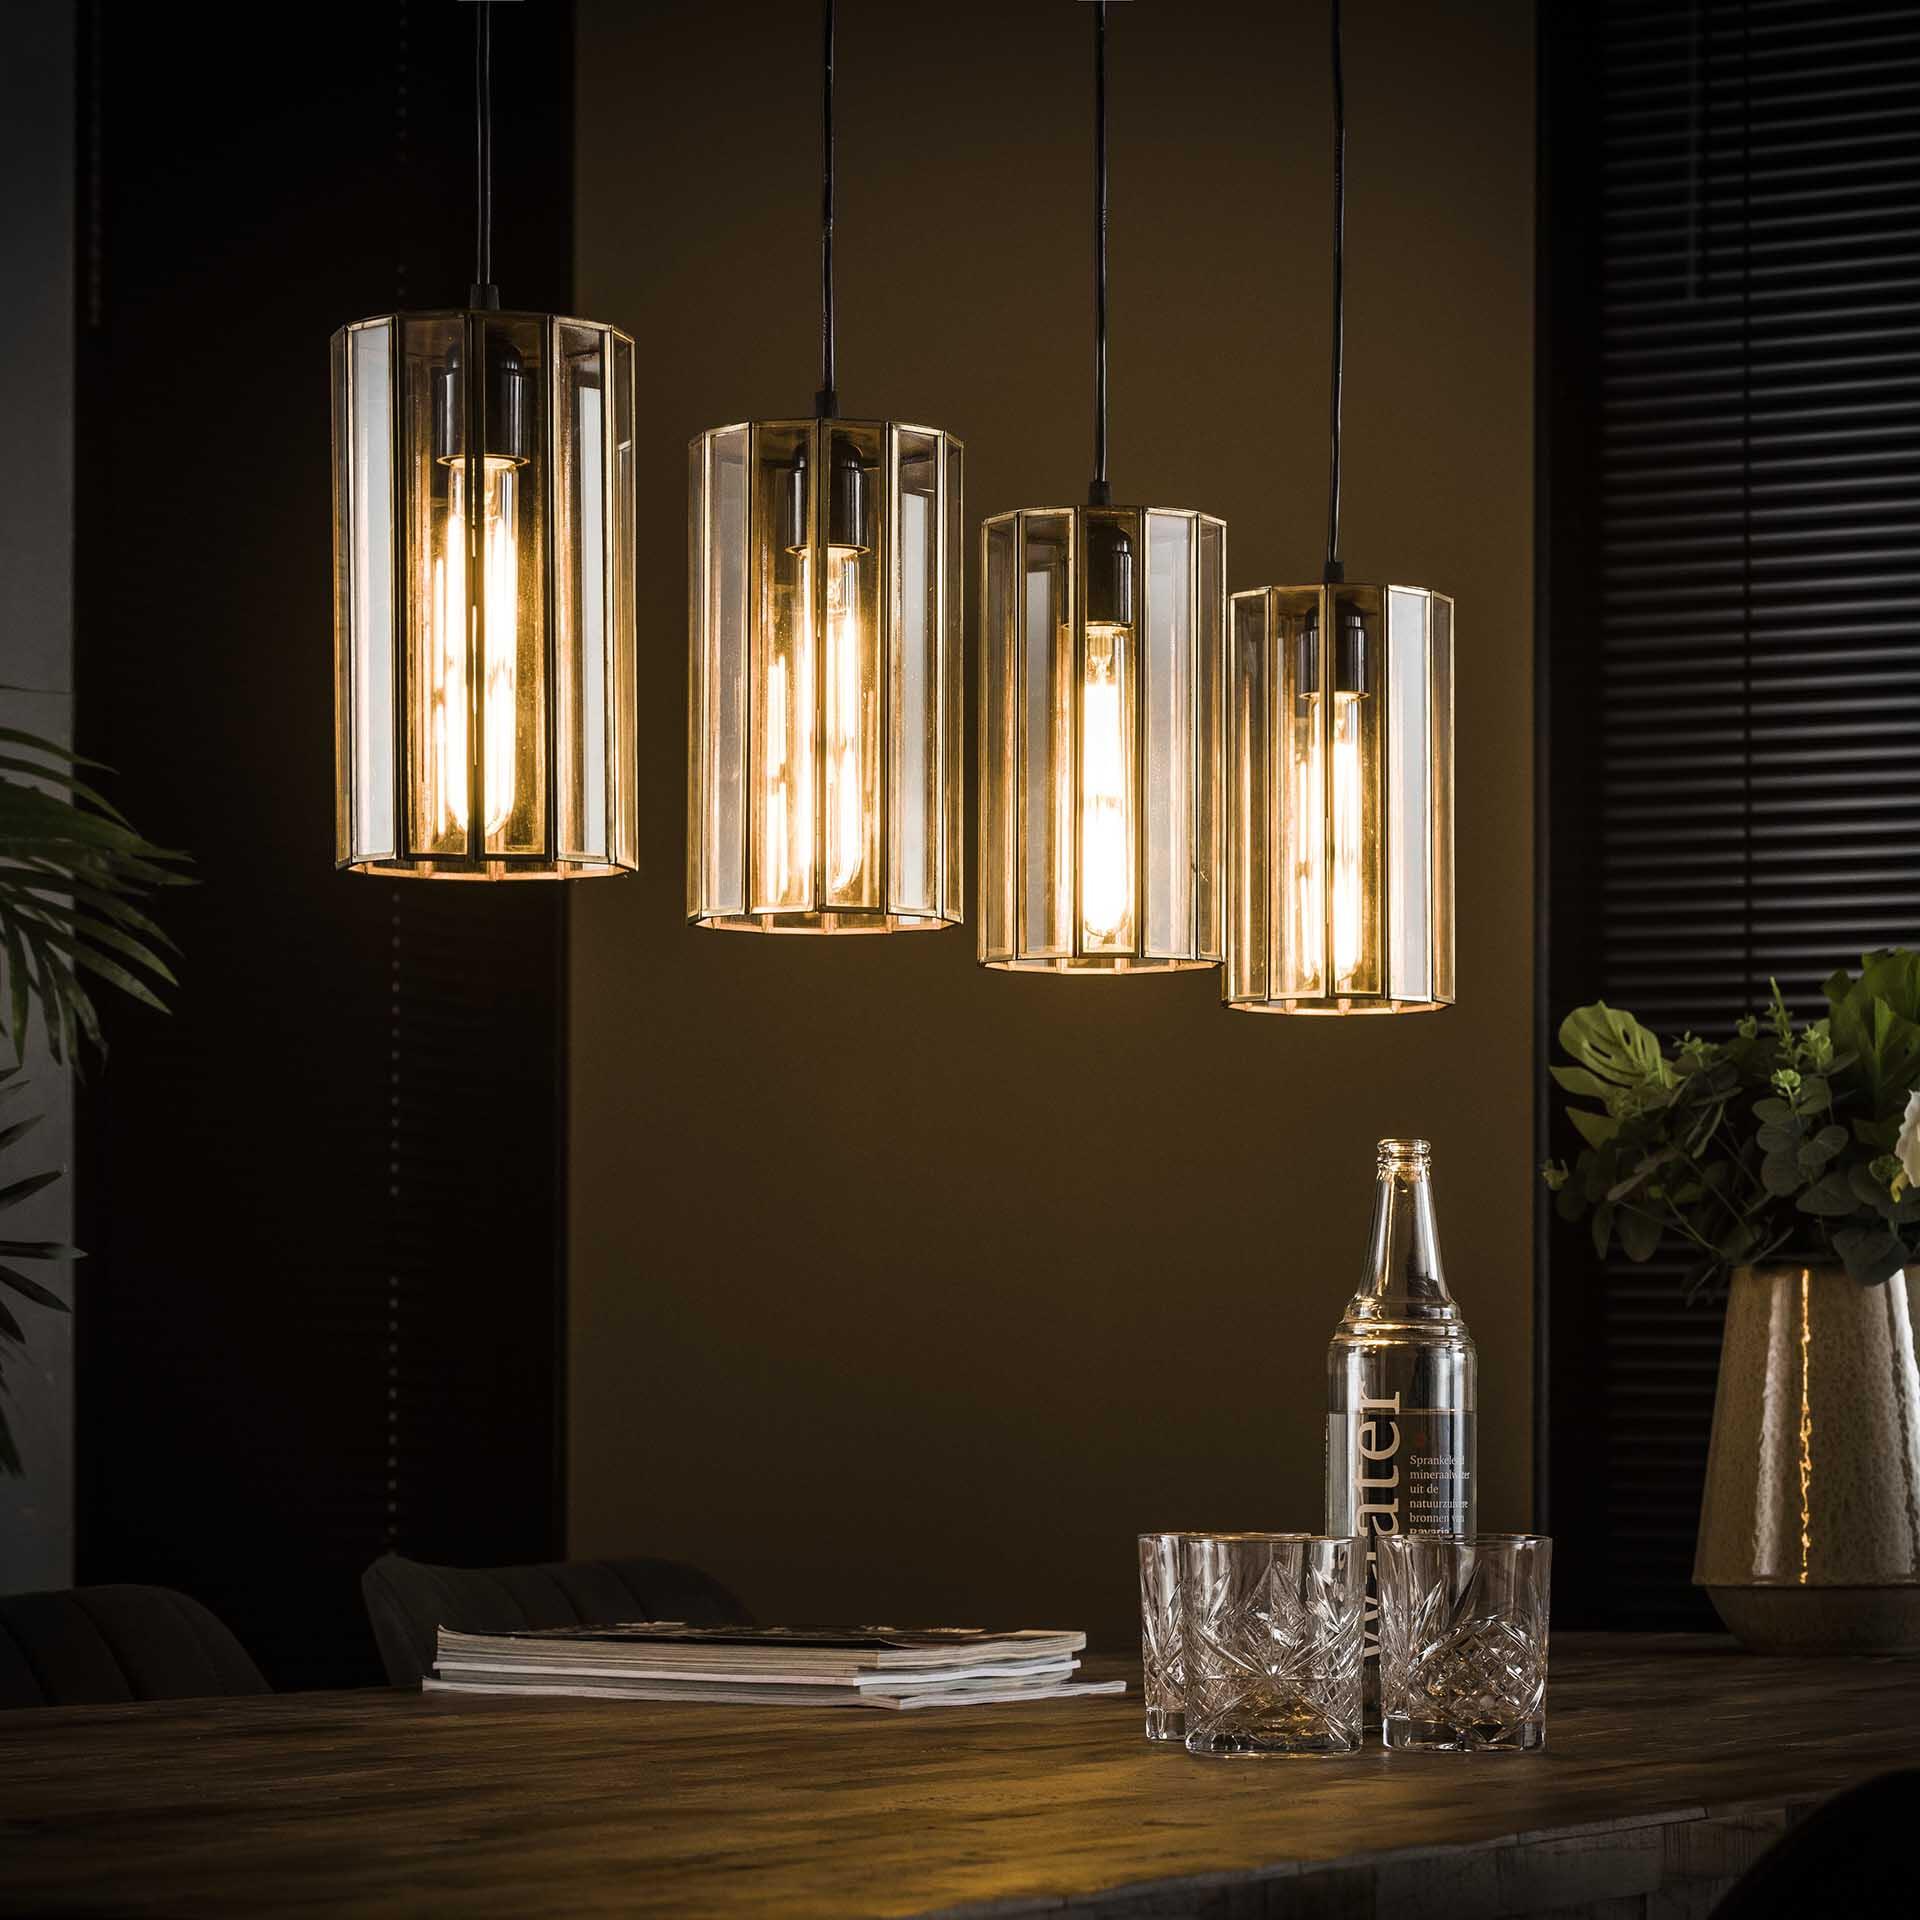 Hanglamp 'Douwe' 4-lamps, kleur Brons antiek